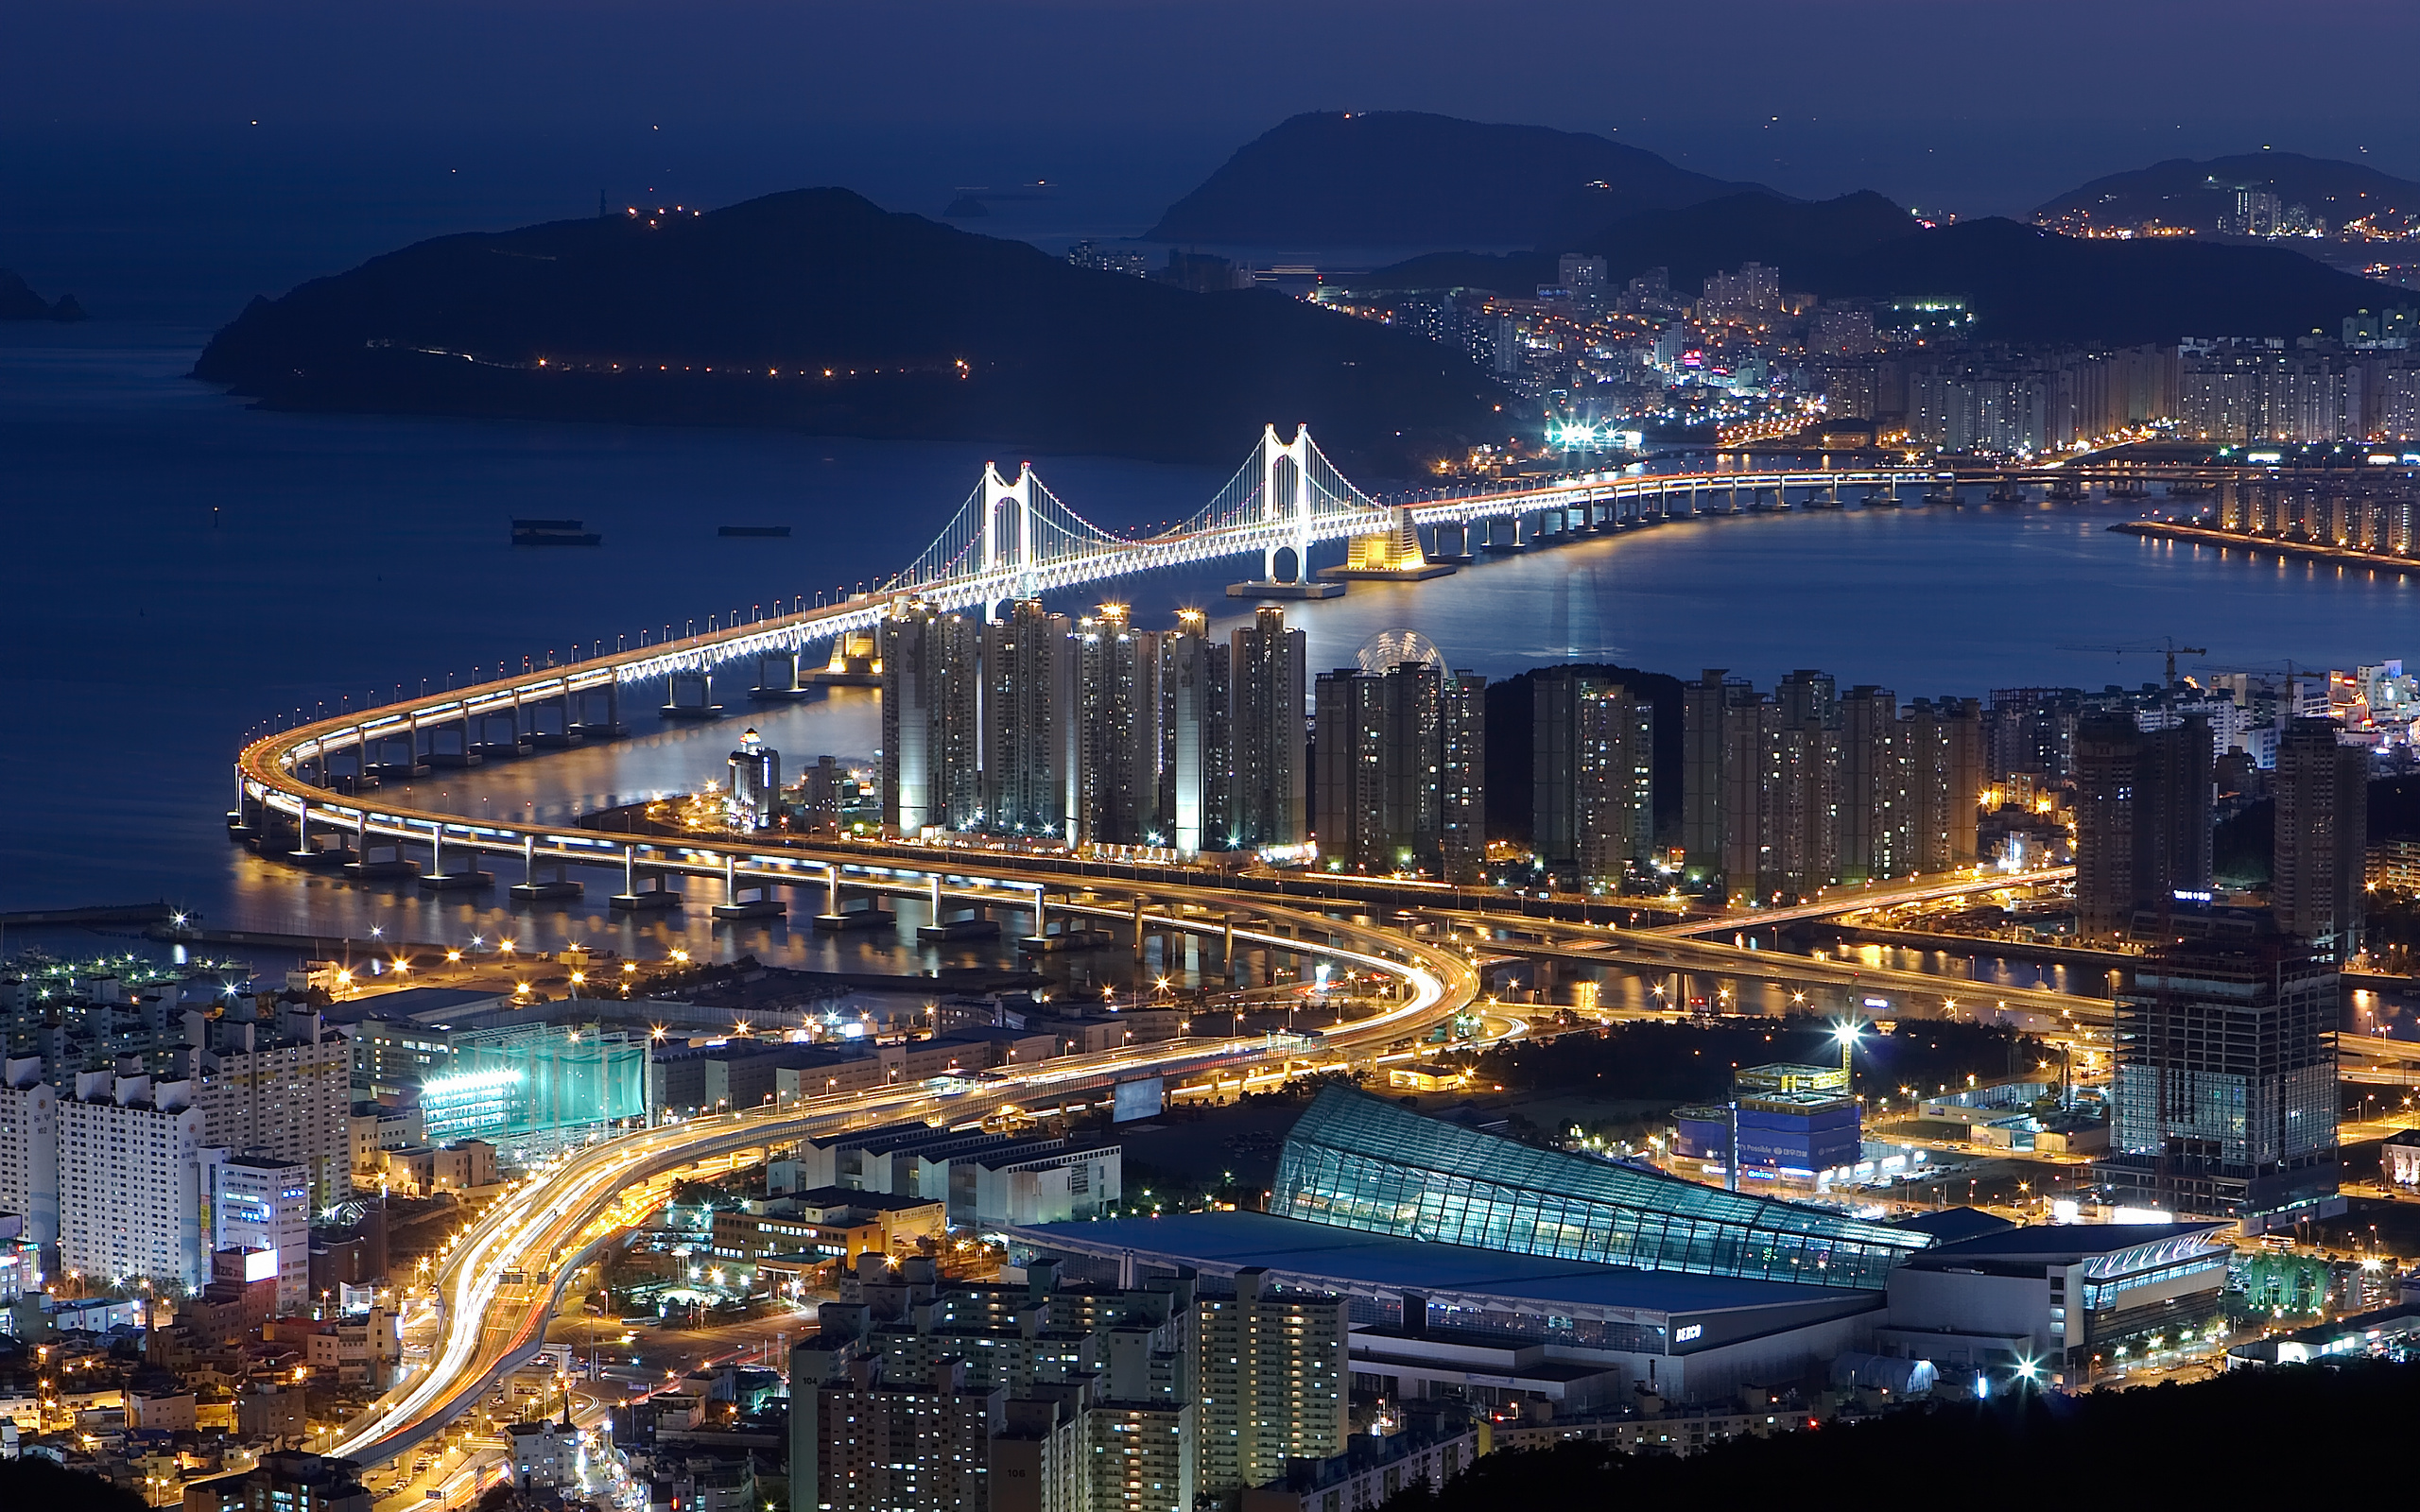 залив, ночь, дома, Город, мост, огни